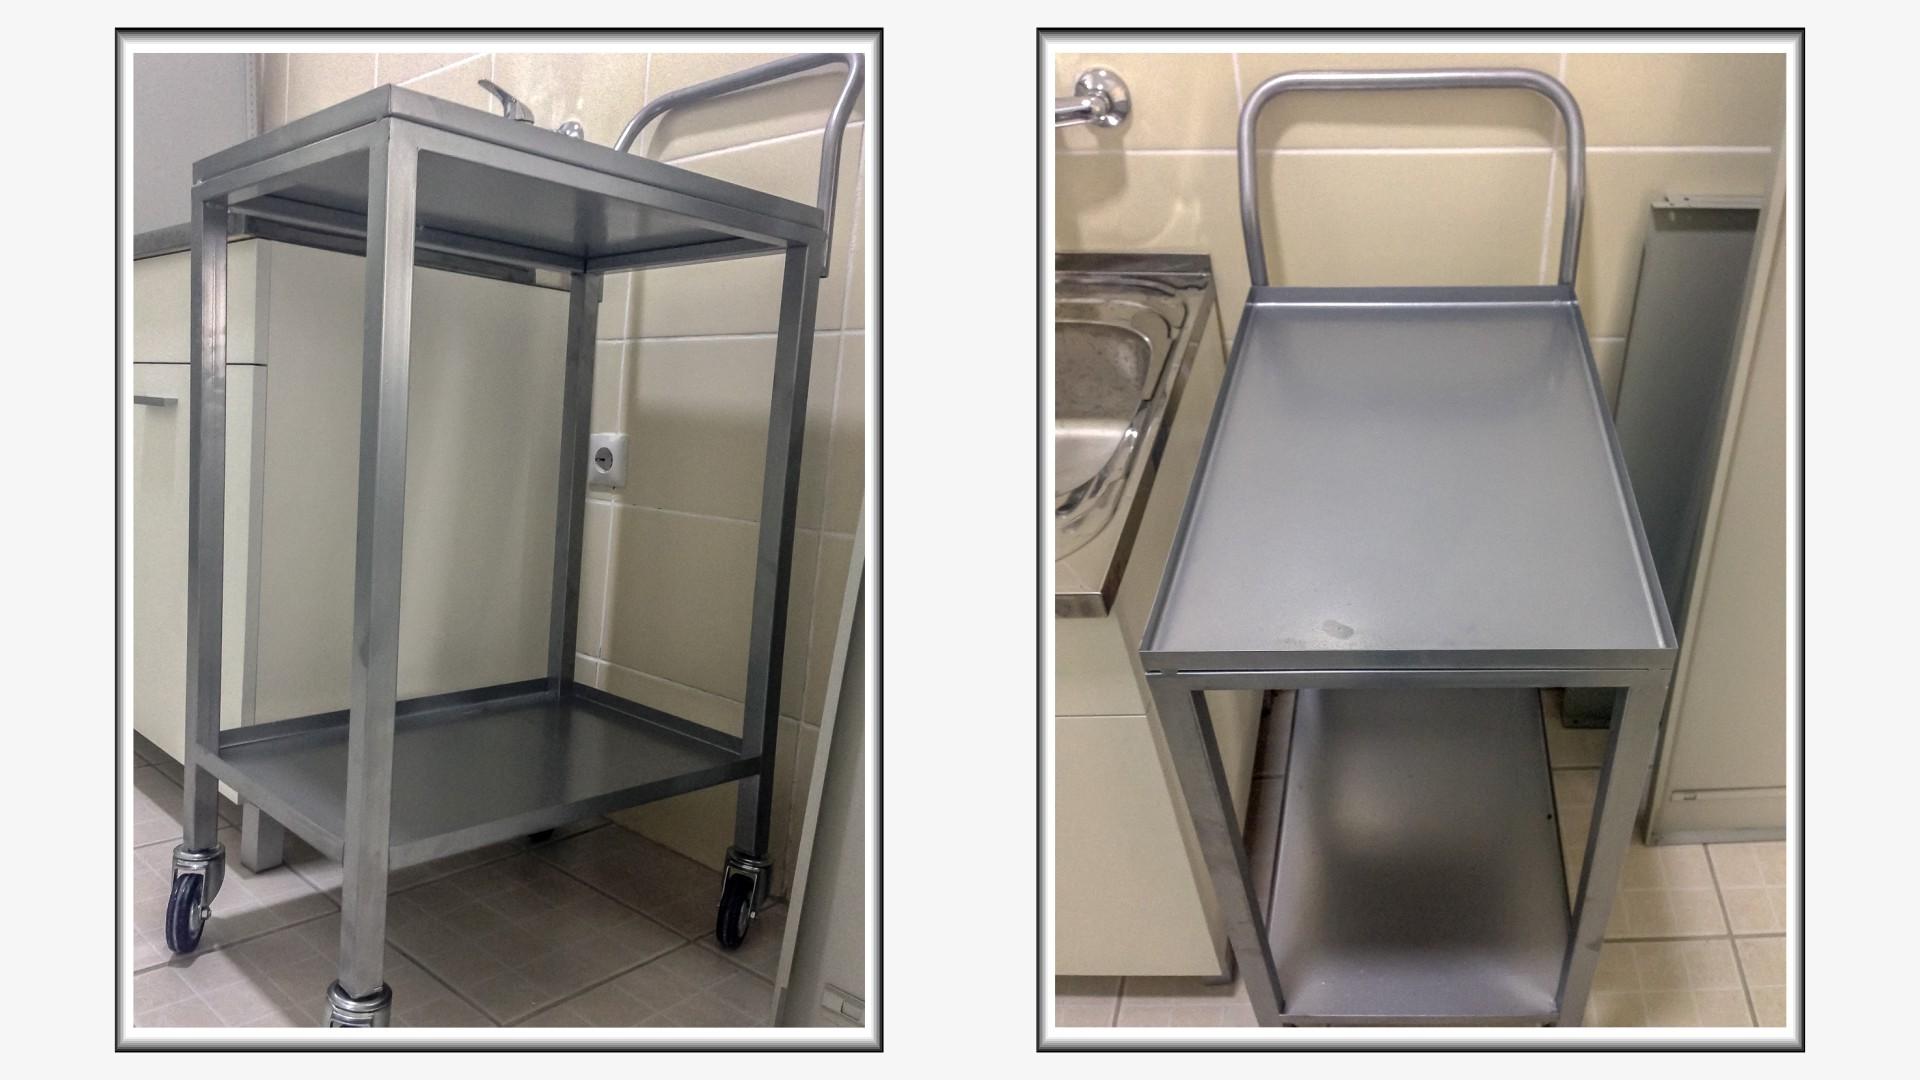 Metalna kolica za instrumente u veterini